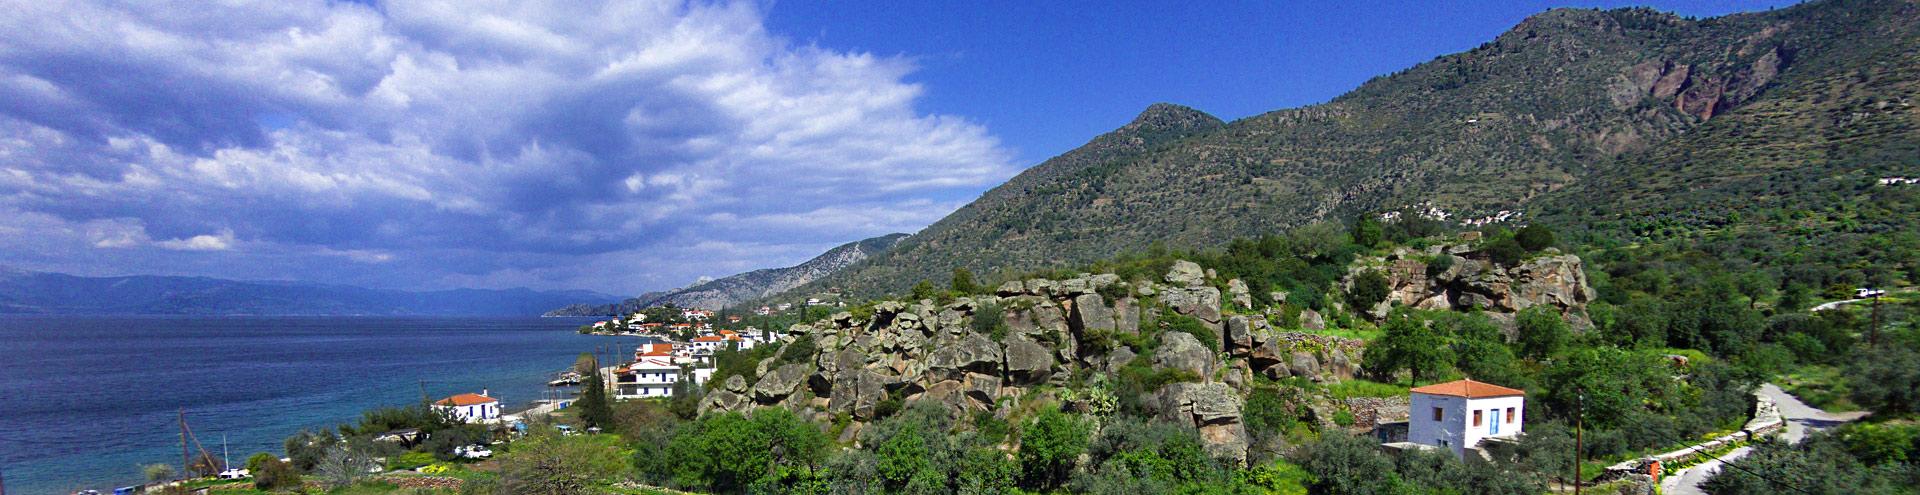 Akropolis Paliokastro